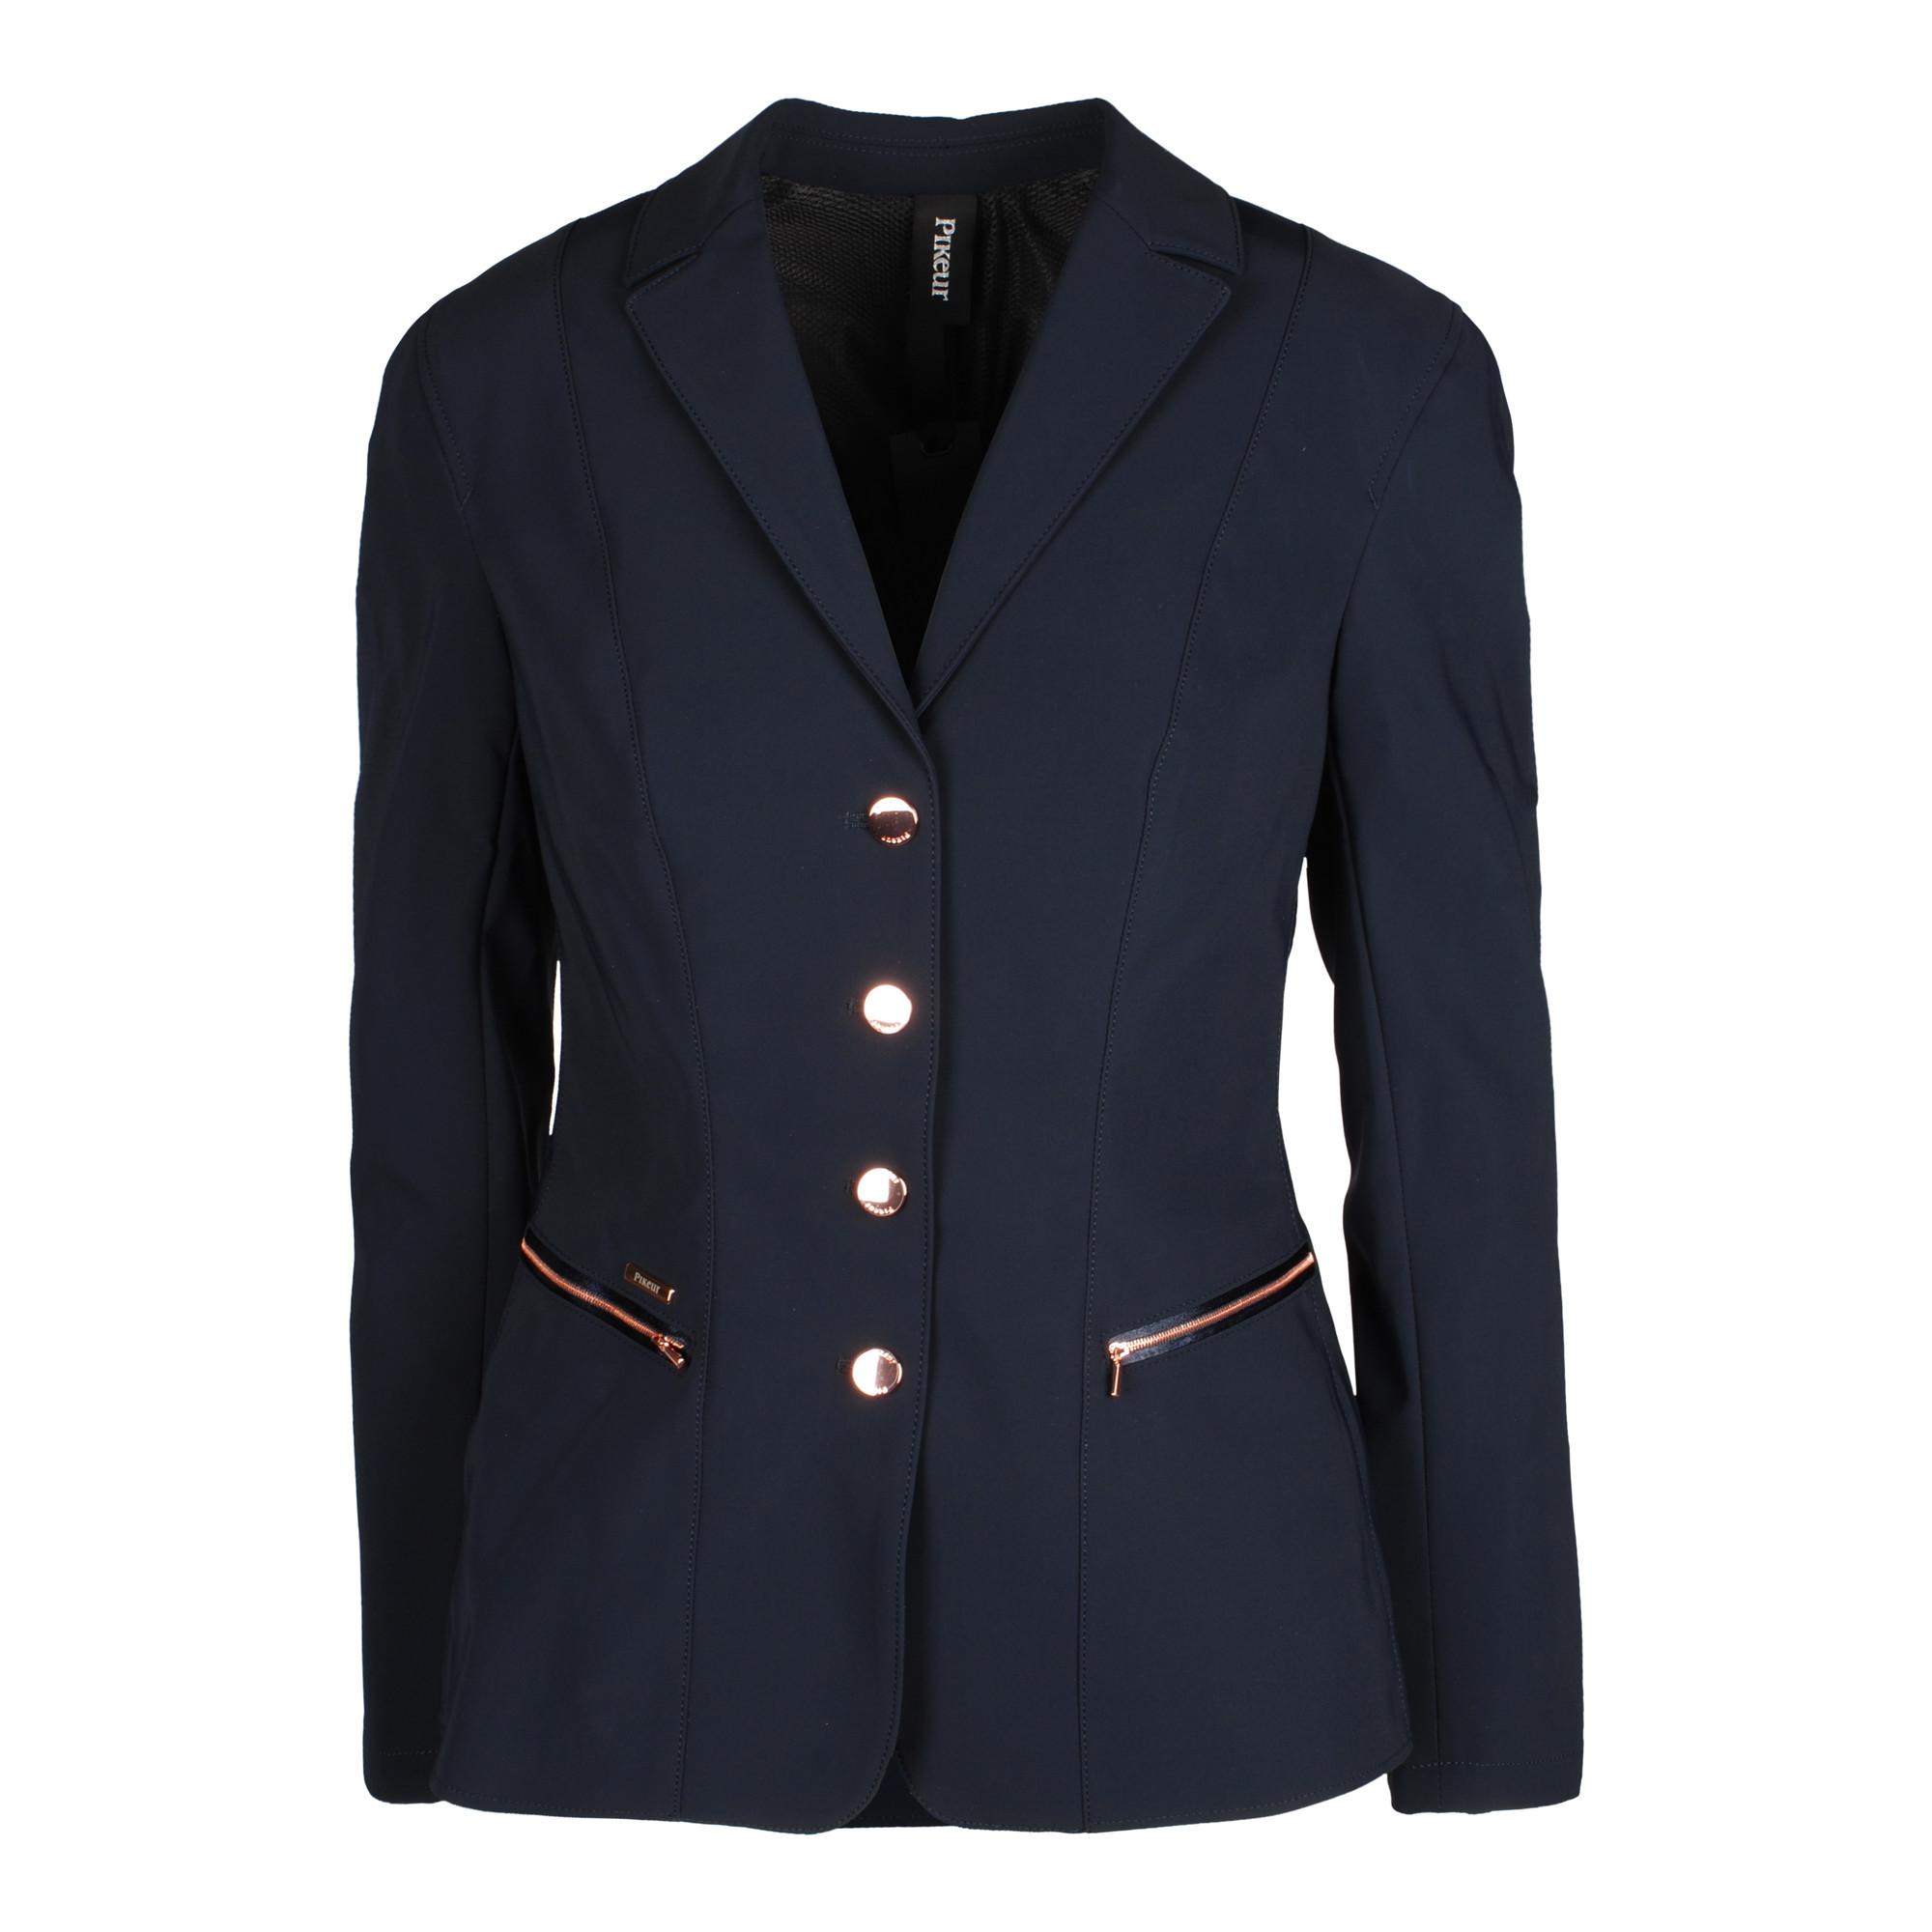 Pikeur Paulin rijjas donkerblauw donkerblauw maat:38